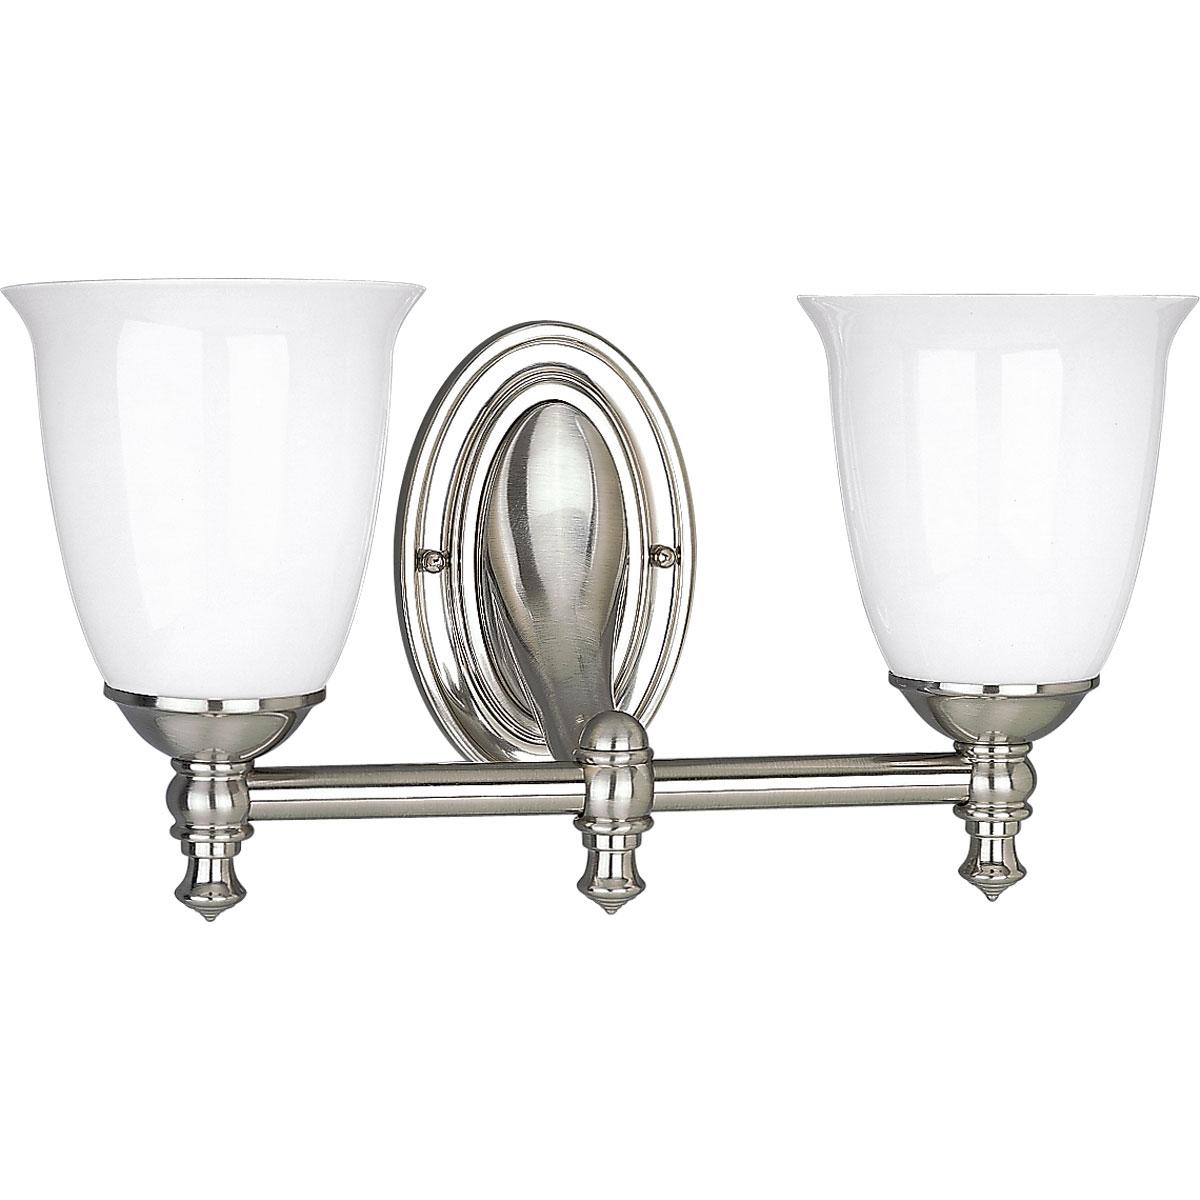 PRO P3028-09 2X100M Brushed Nickel White Opal Glass Vanity